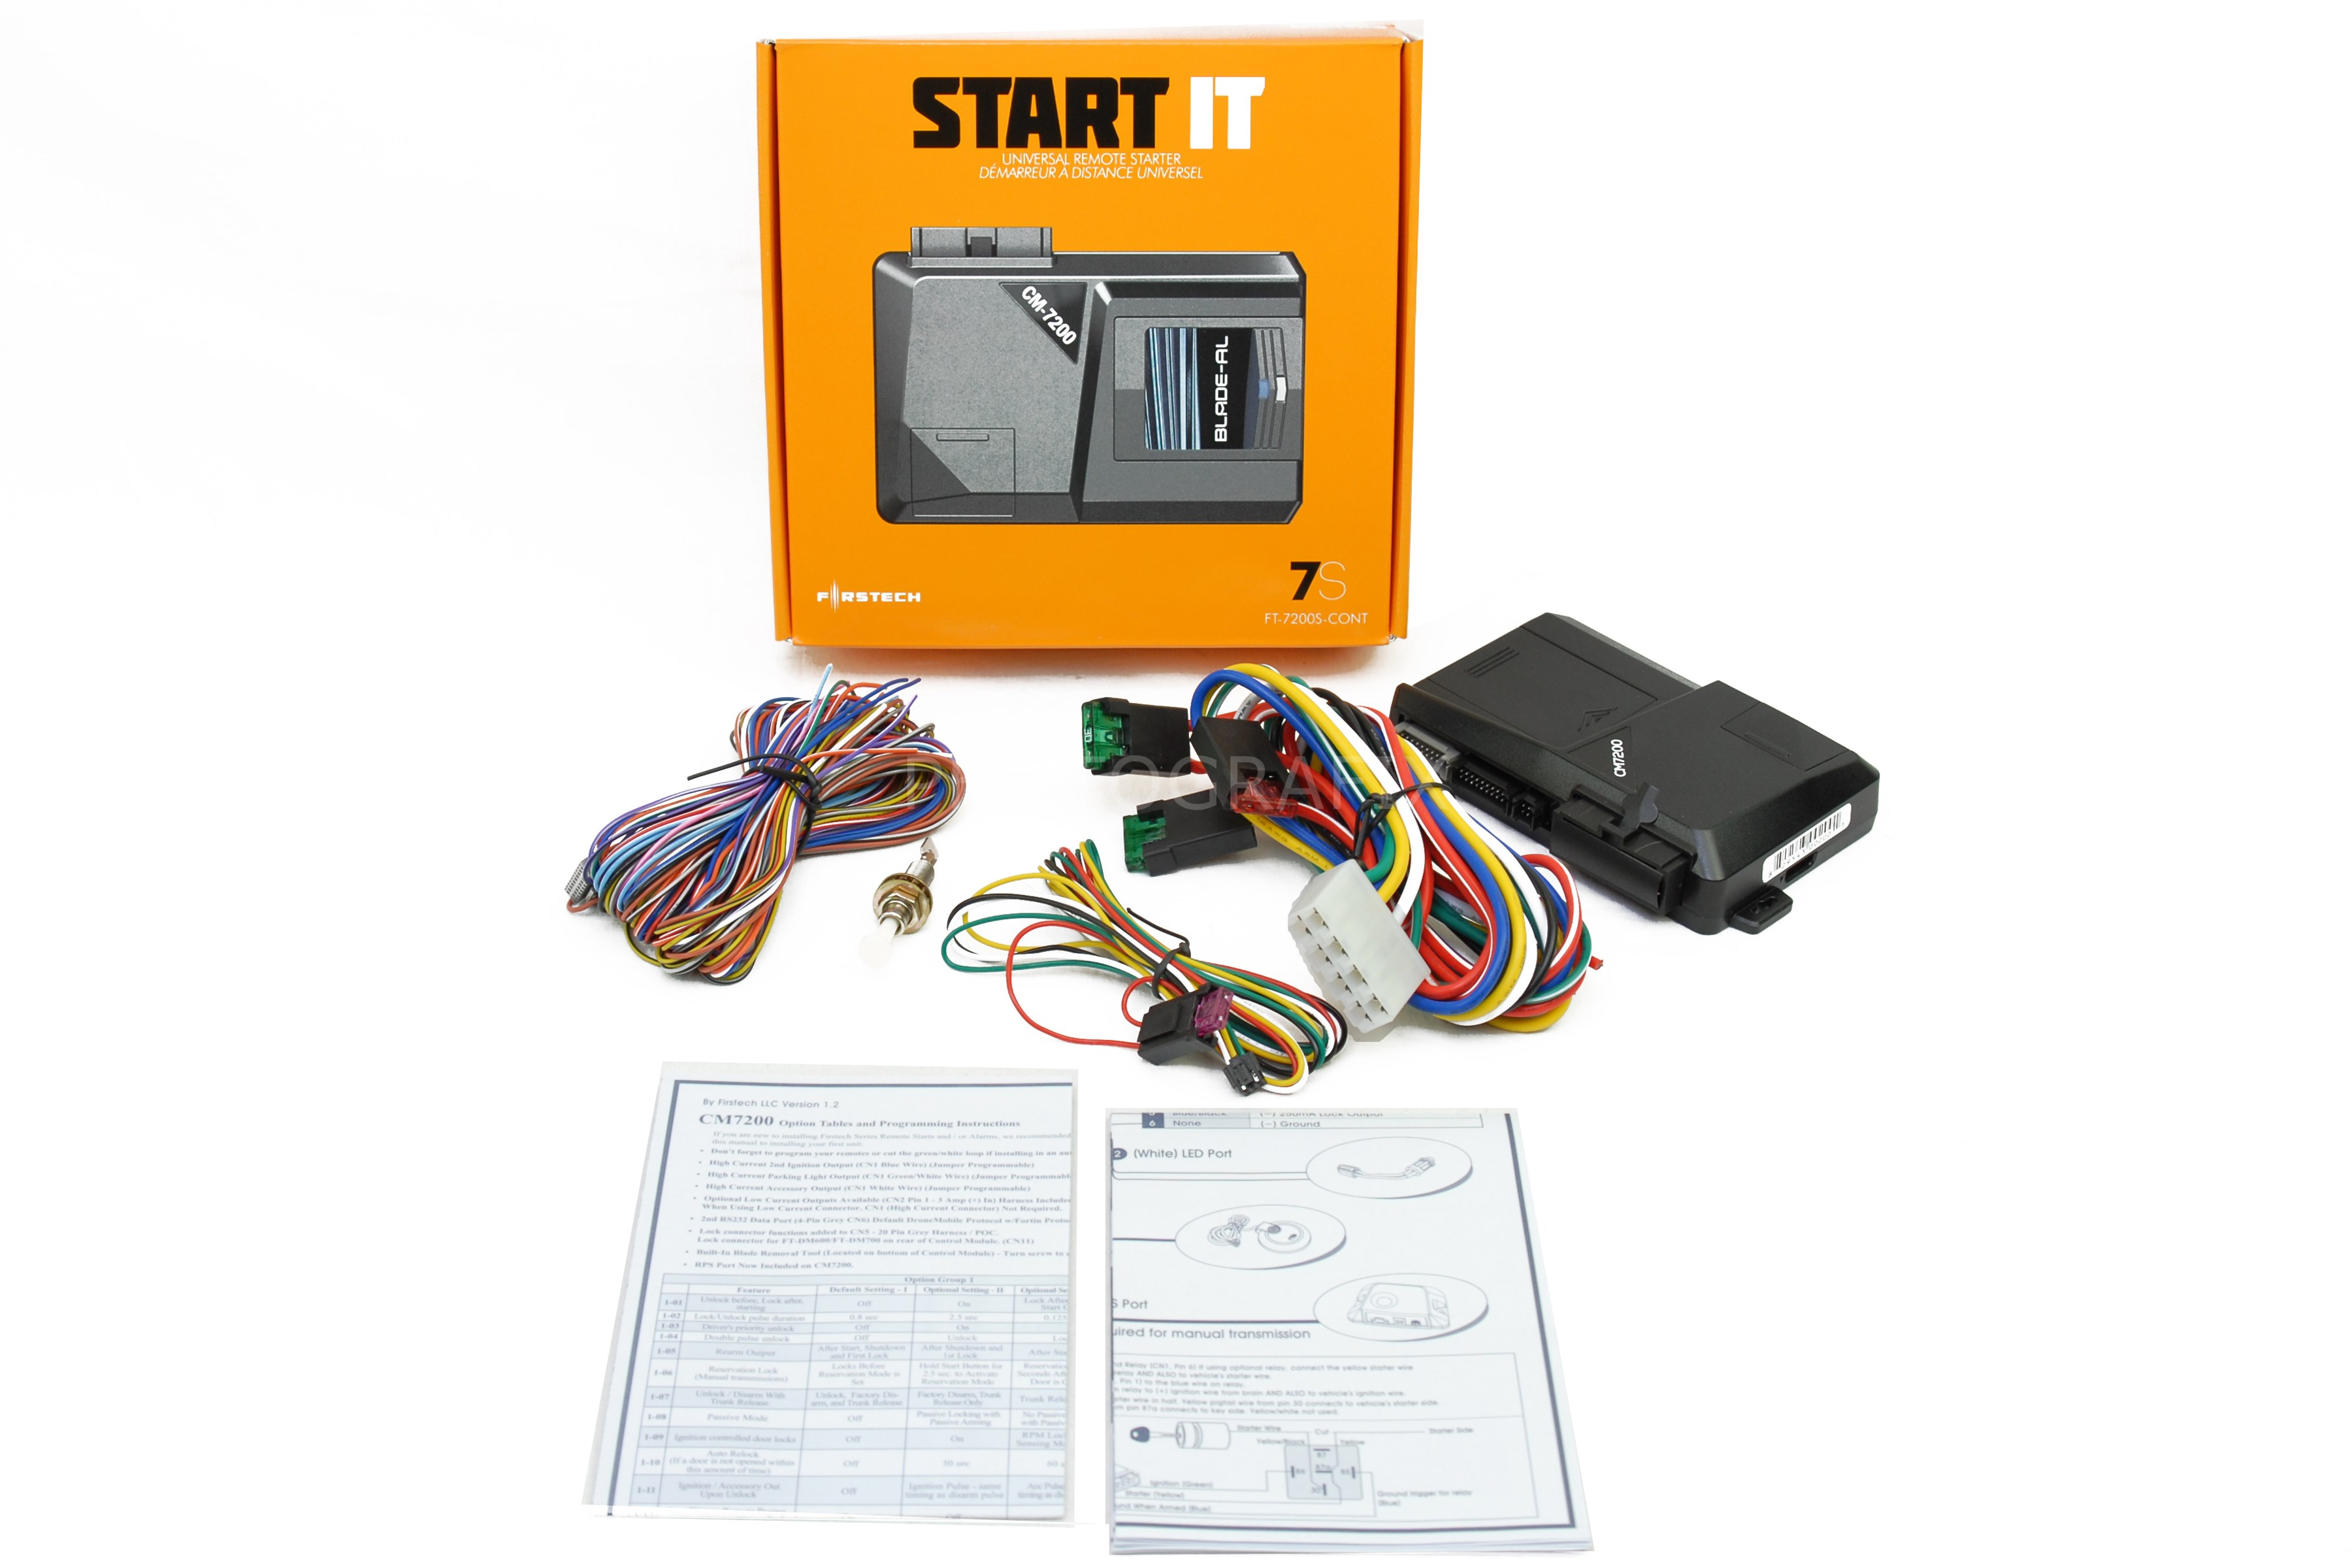 Compustar Remote Start Wiring Diagram 7200 Diagrams Bulldog Keyless Entry Ft7200s Control Ft 6900s